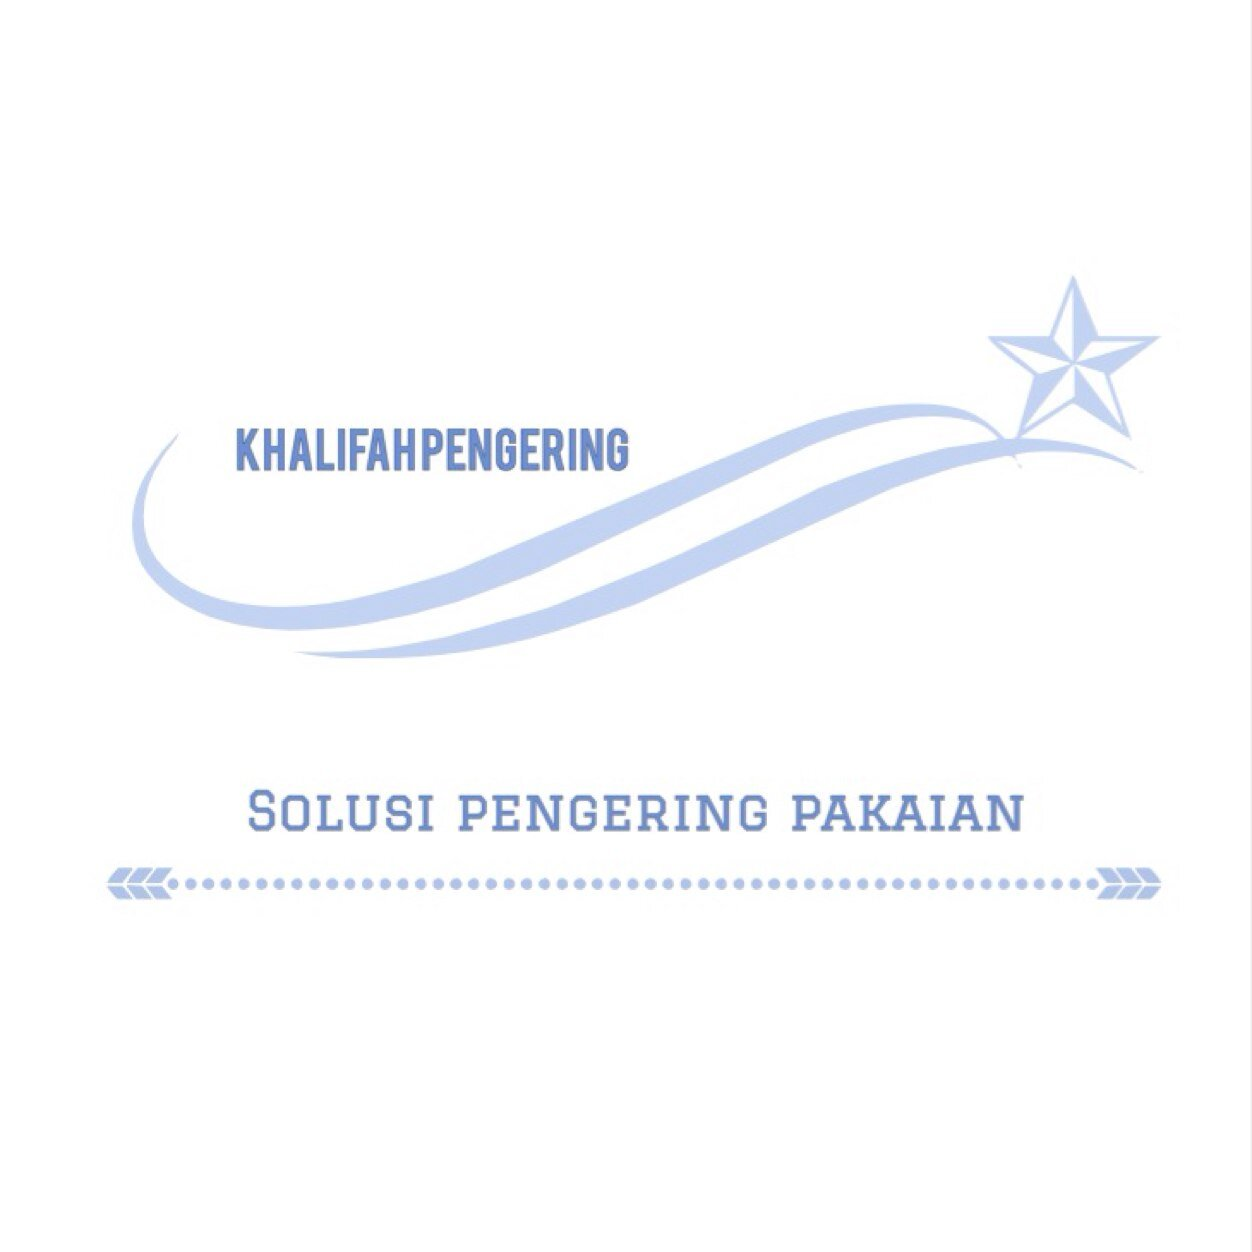 KhalifahPengering